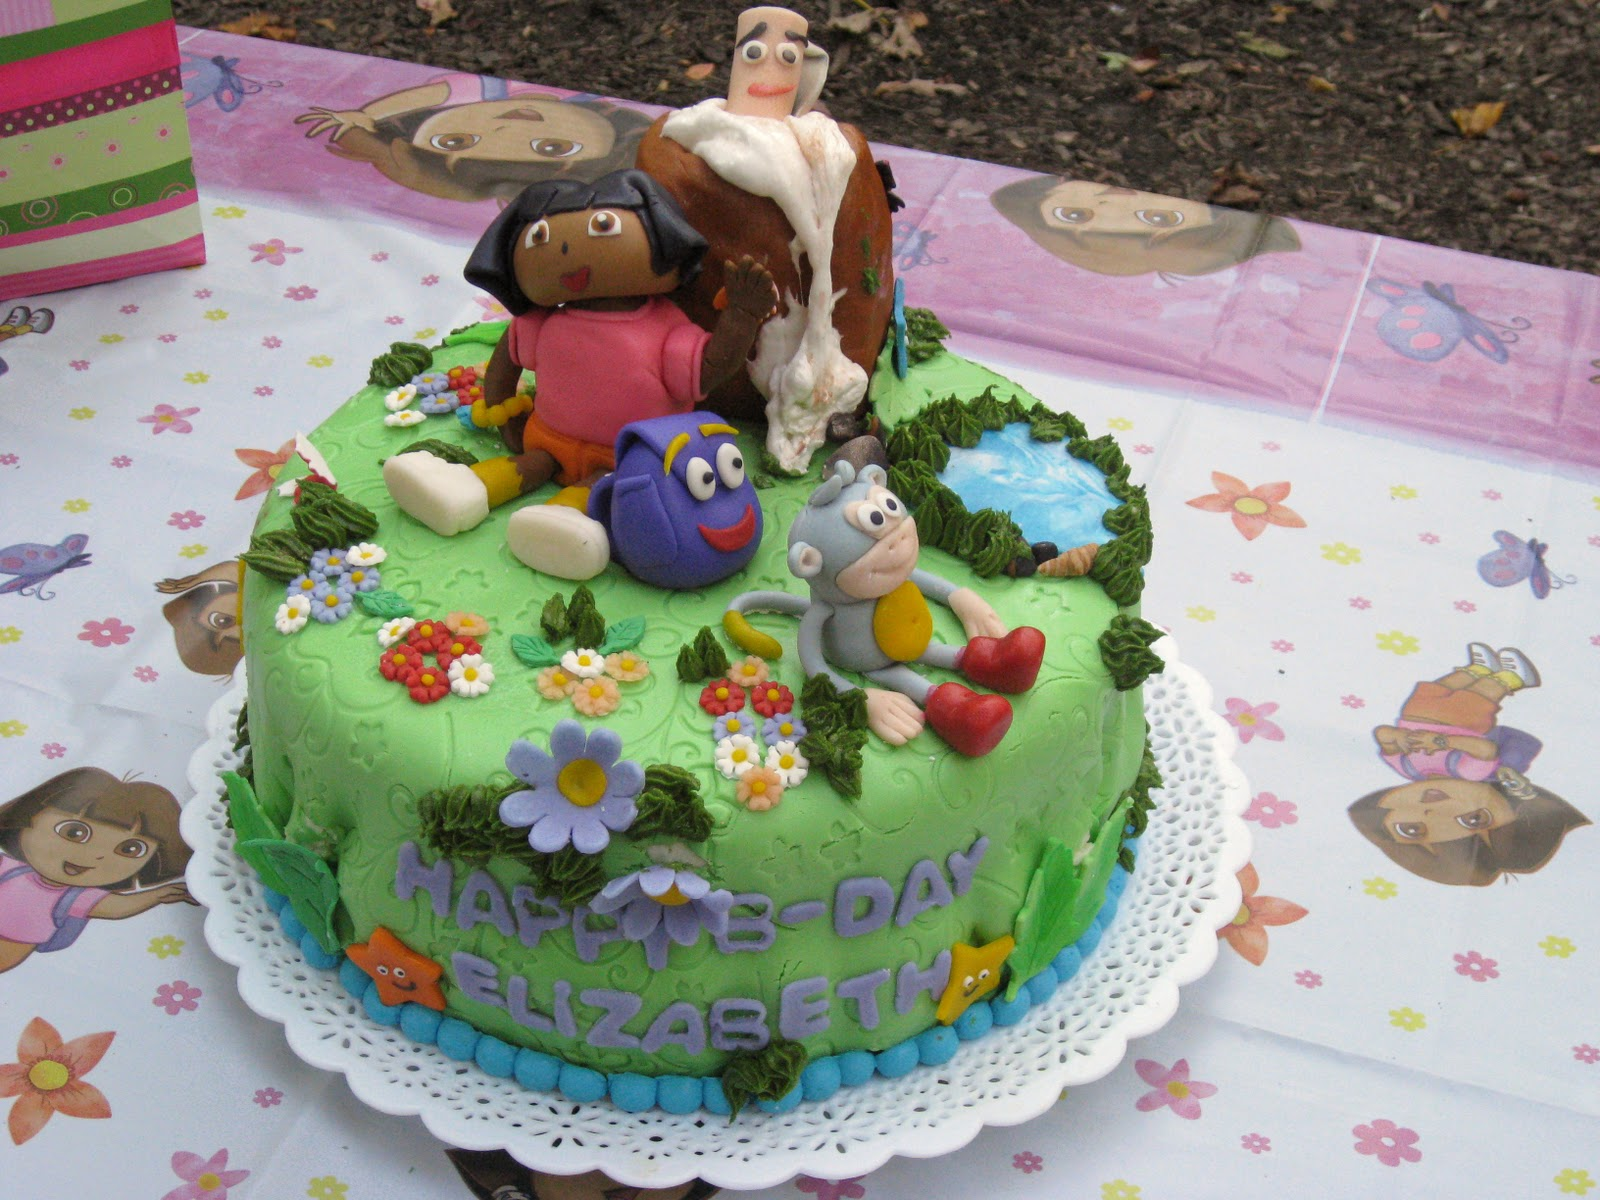 Related pictures decoracion fiestas infantiles goma eva for Decoracion de tortas infantiles